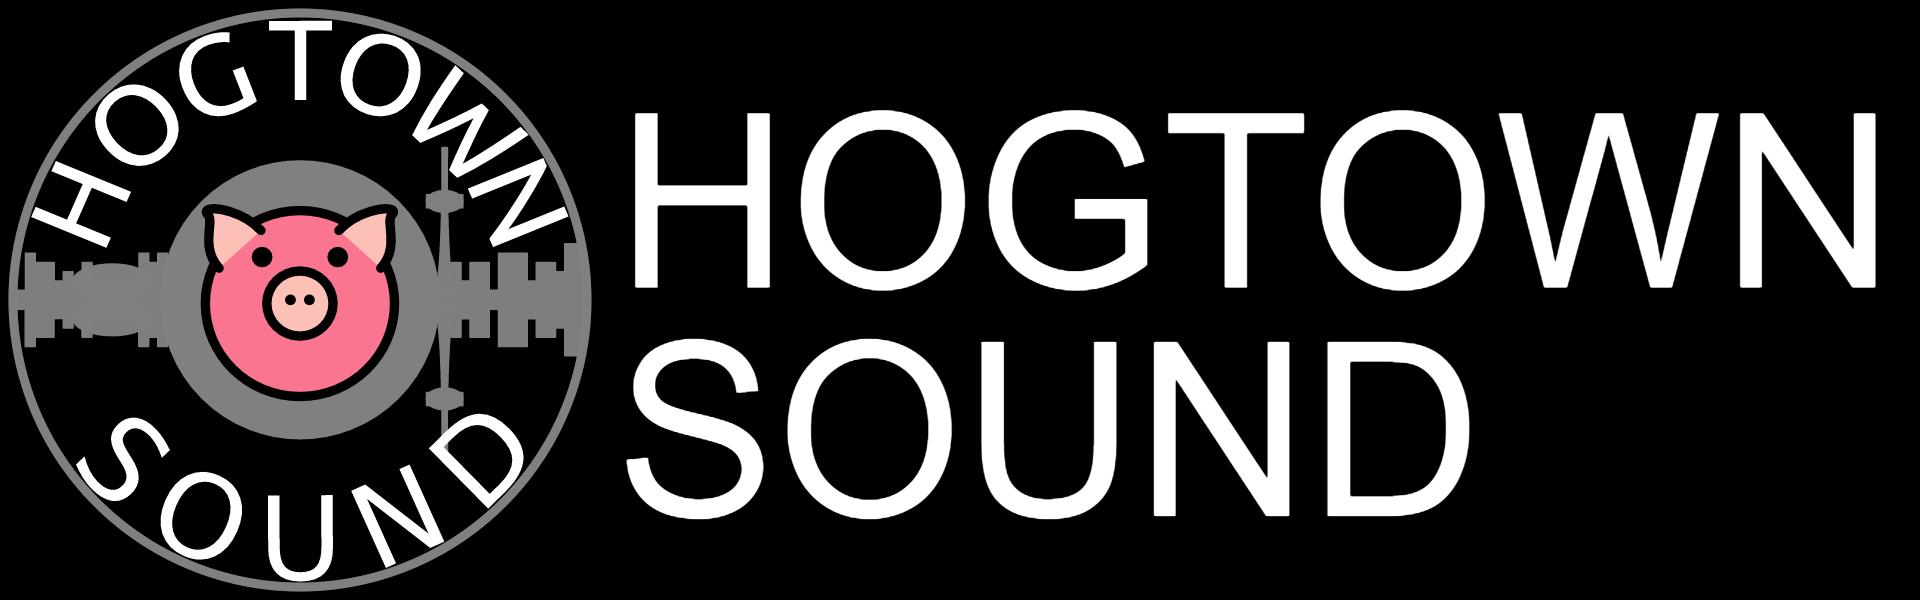 Hogtown Sound